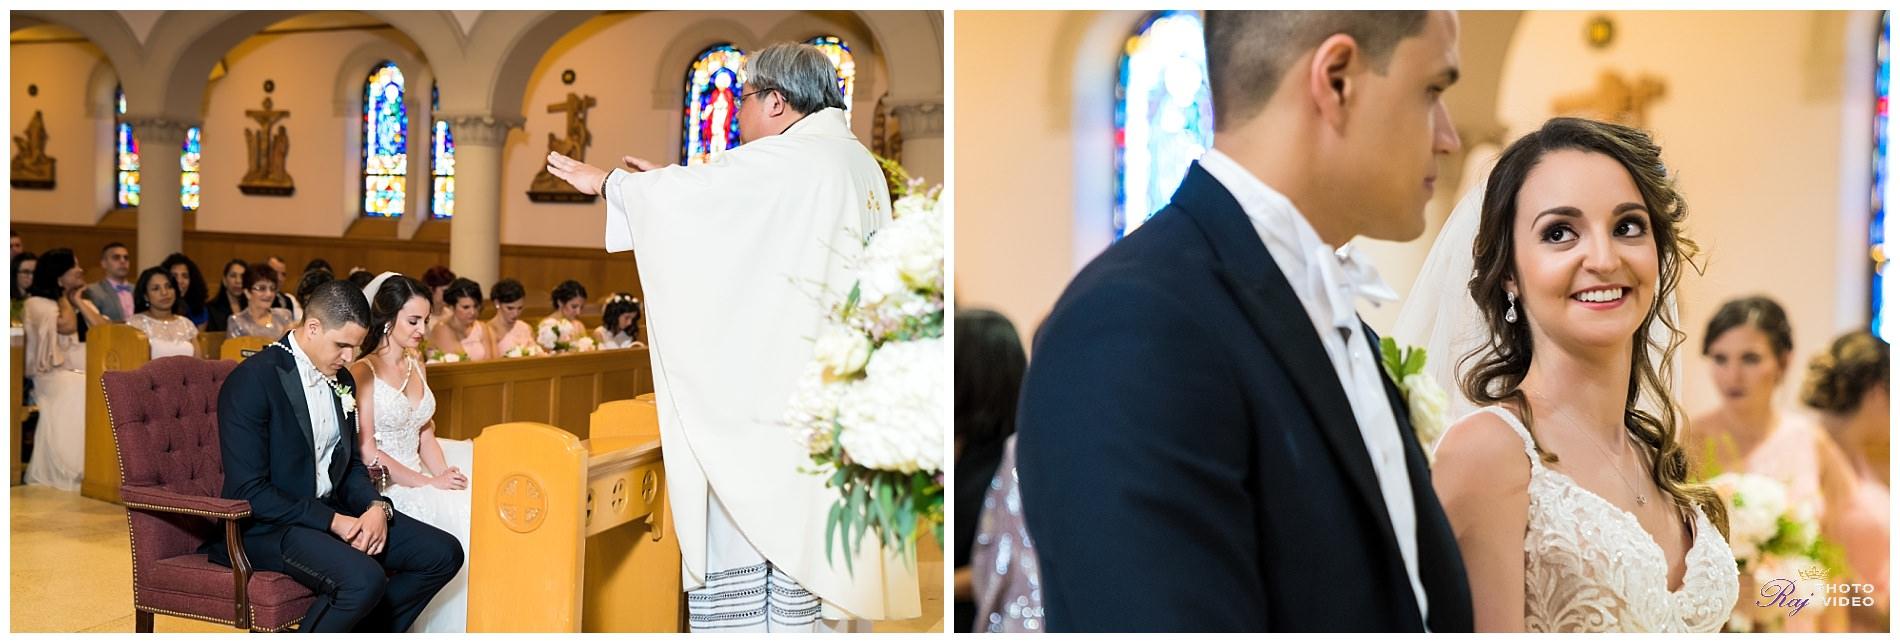 St-Valentines-Catholic-Church-Bloomfield-NJ-Wedding-Yanet-Jose-12.jpg